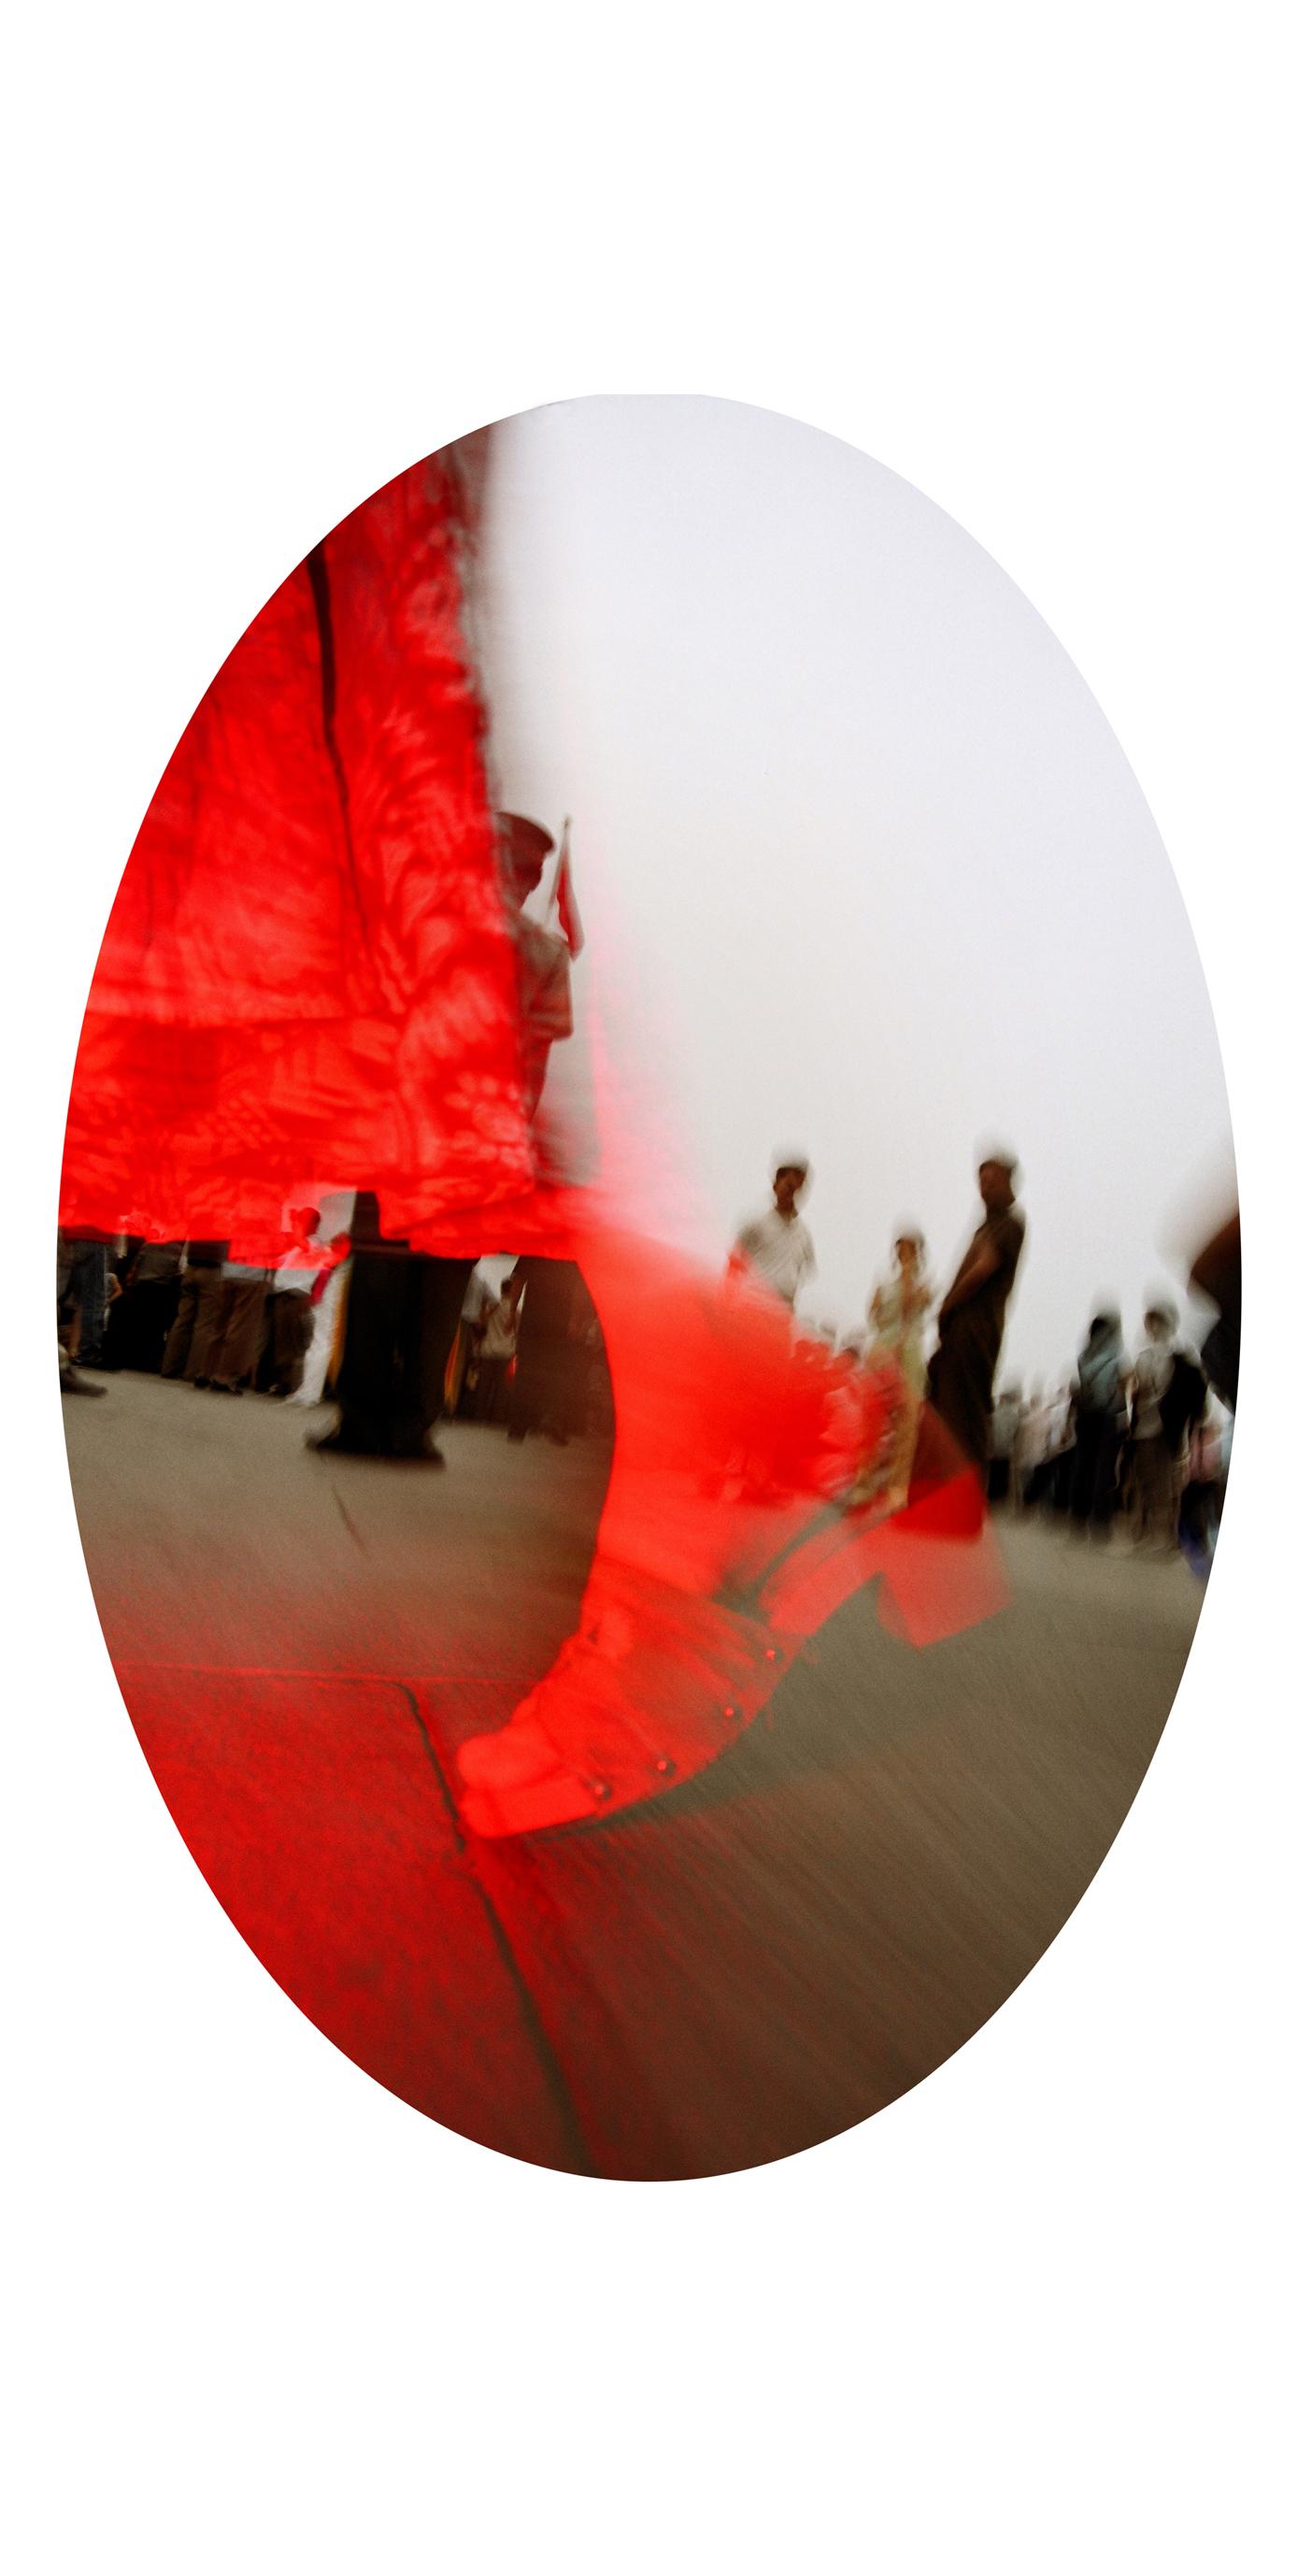 6-the unbearable lightness of Takako dress-Moyi - Dog eye - Chongzi & her red skirt - 03-moyi-photography-of-china.jpg